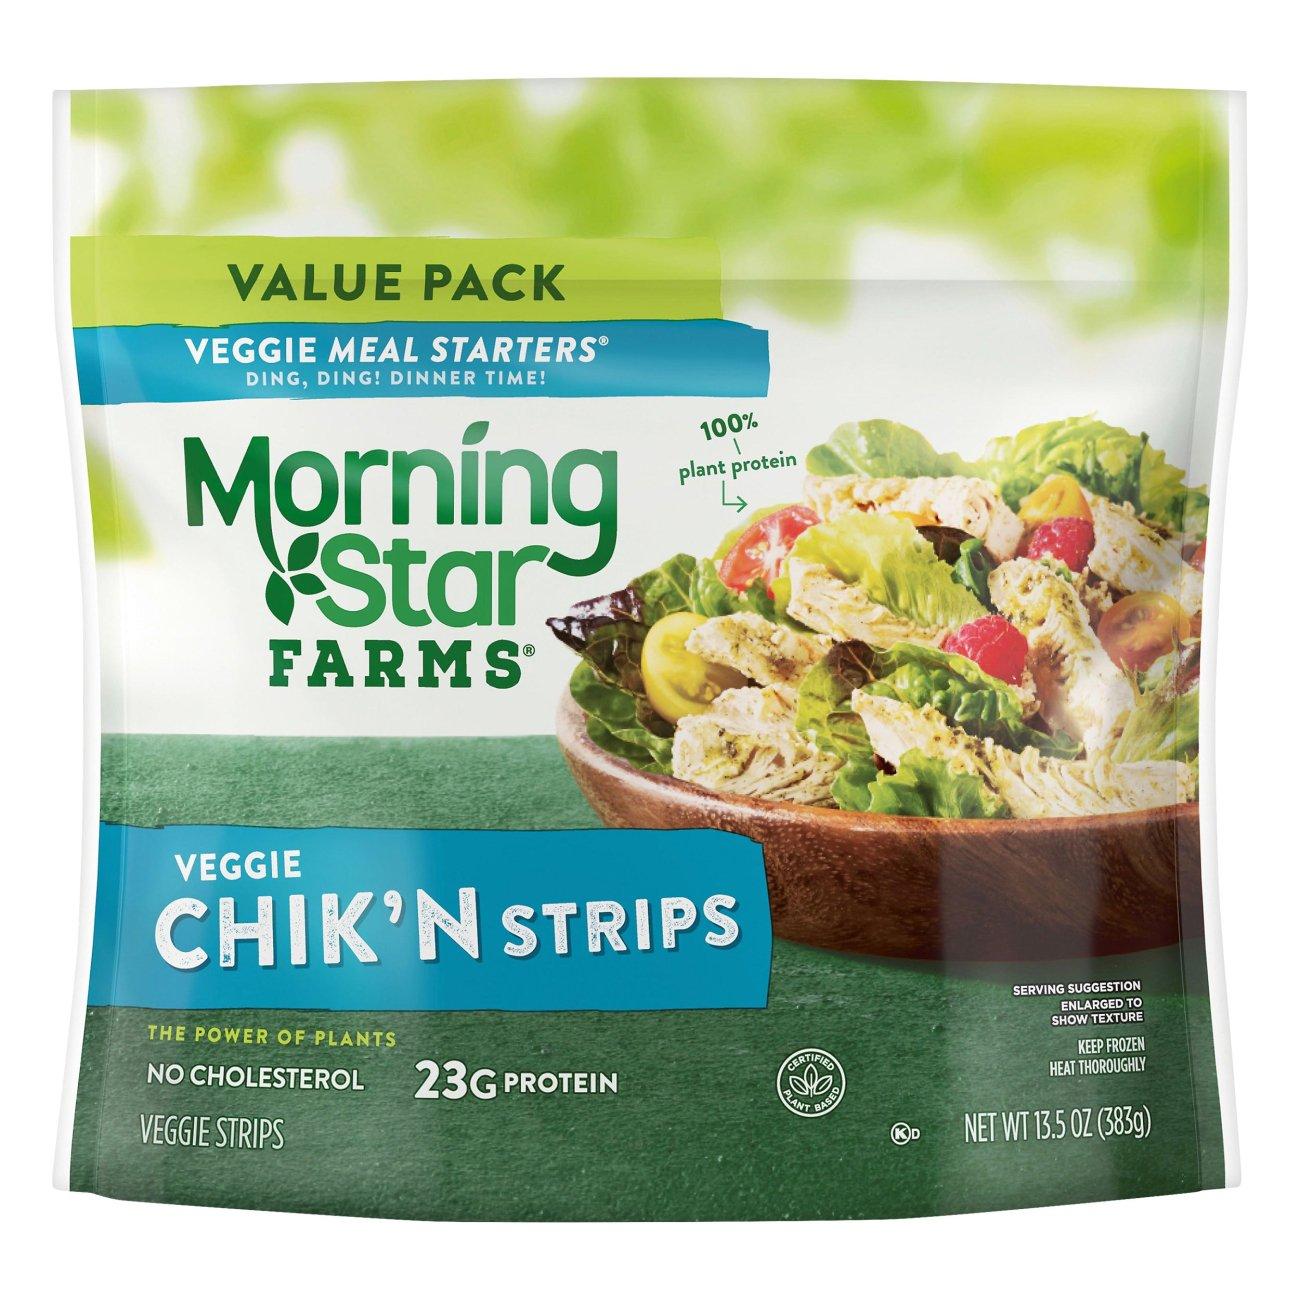 Morningstar Farms Meal Starters Chik N Strips Shop Meat Alternatives At H E B